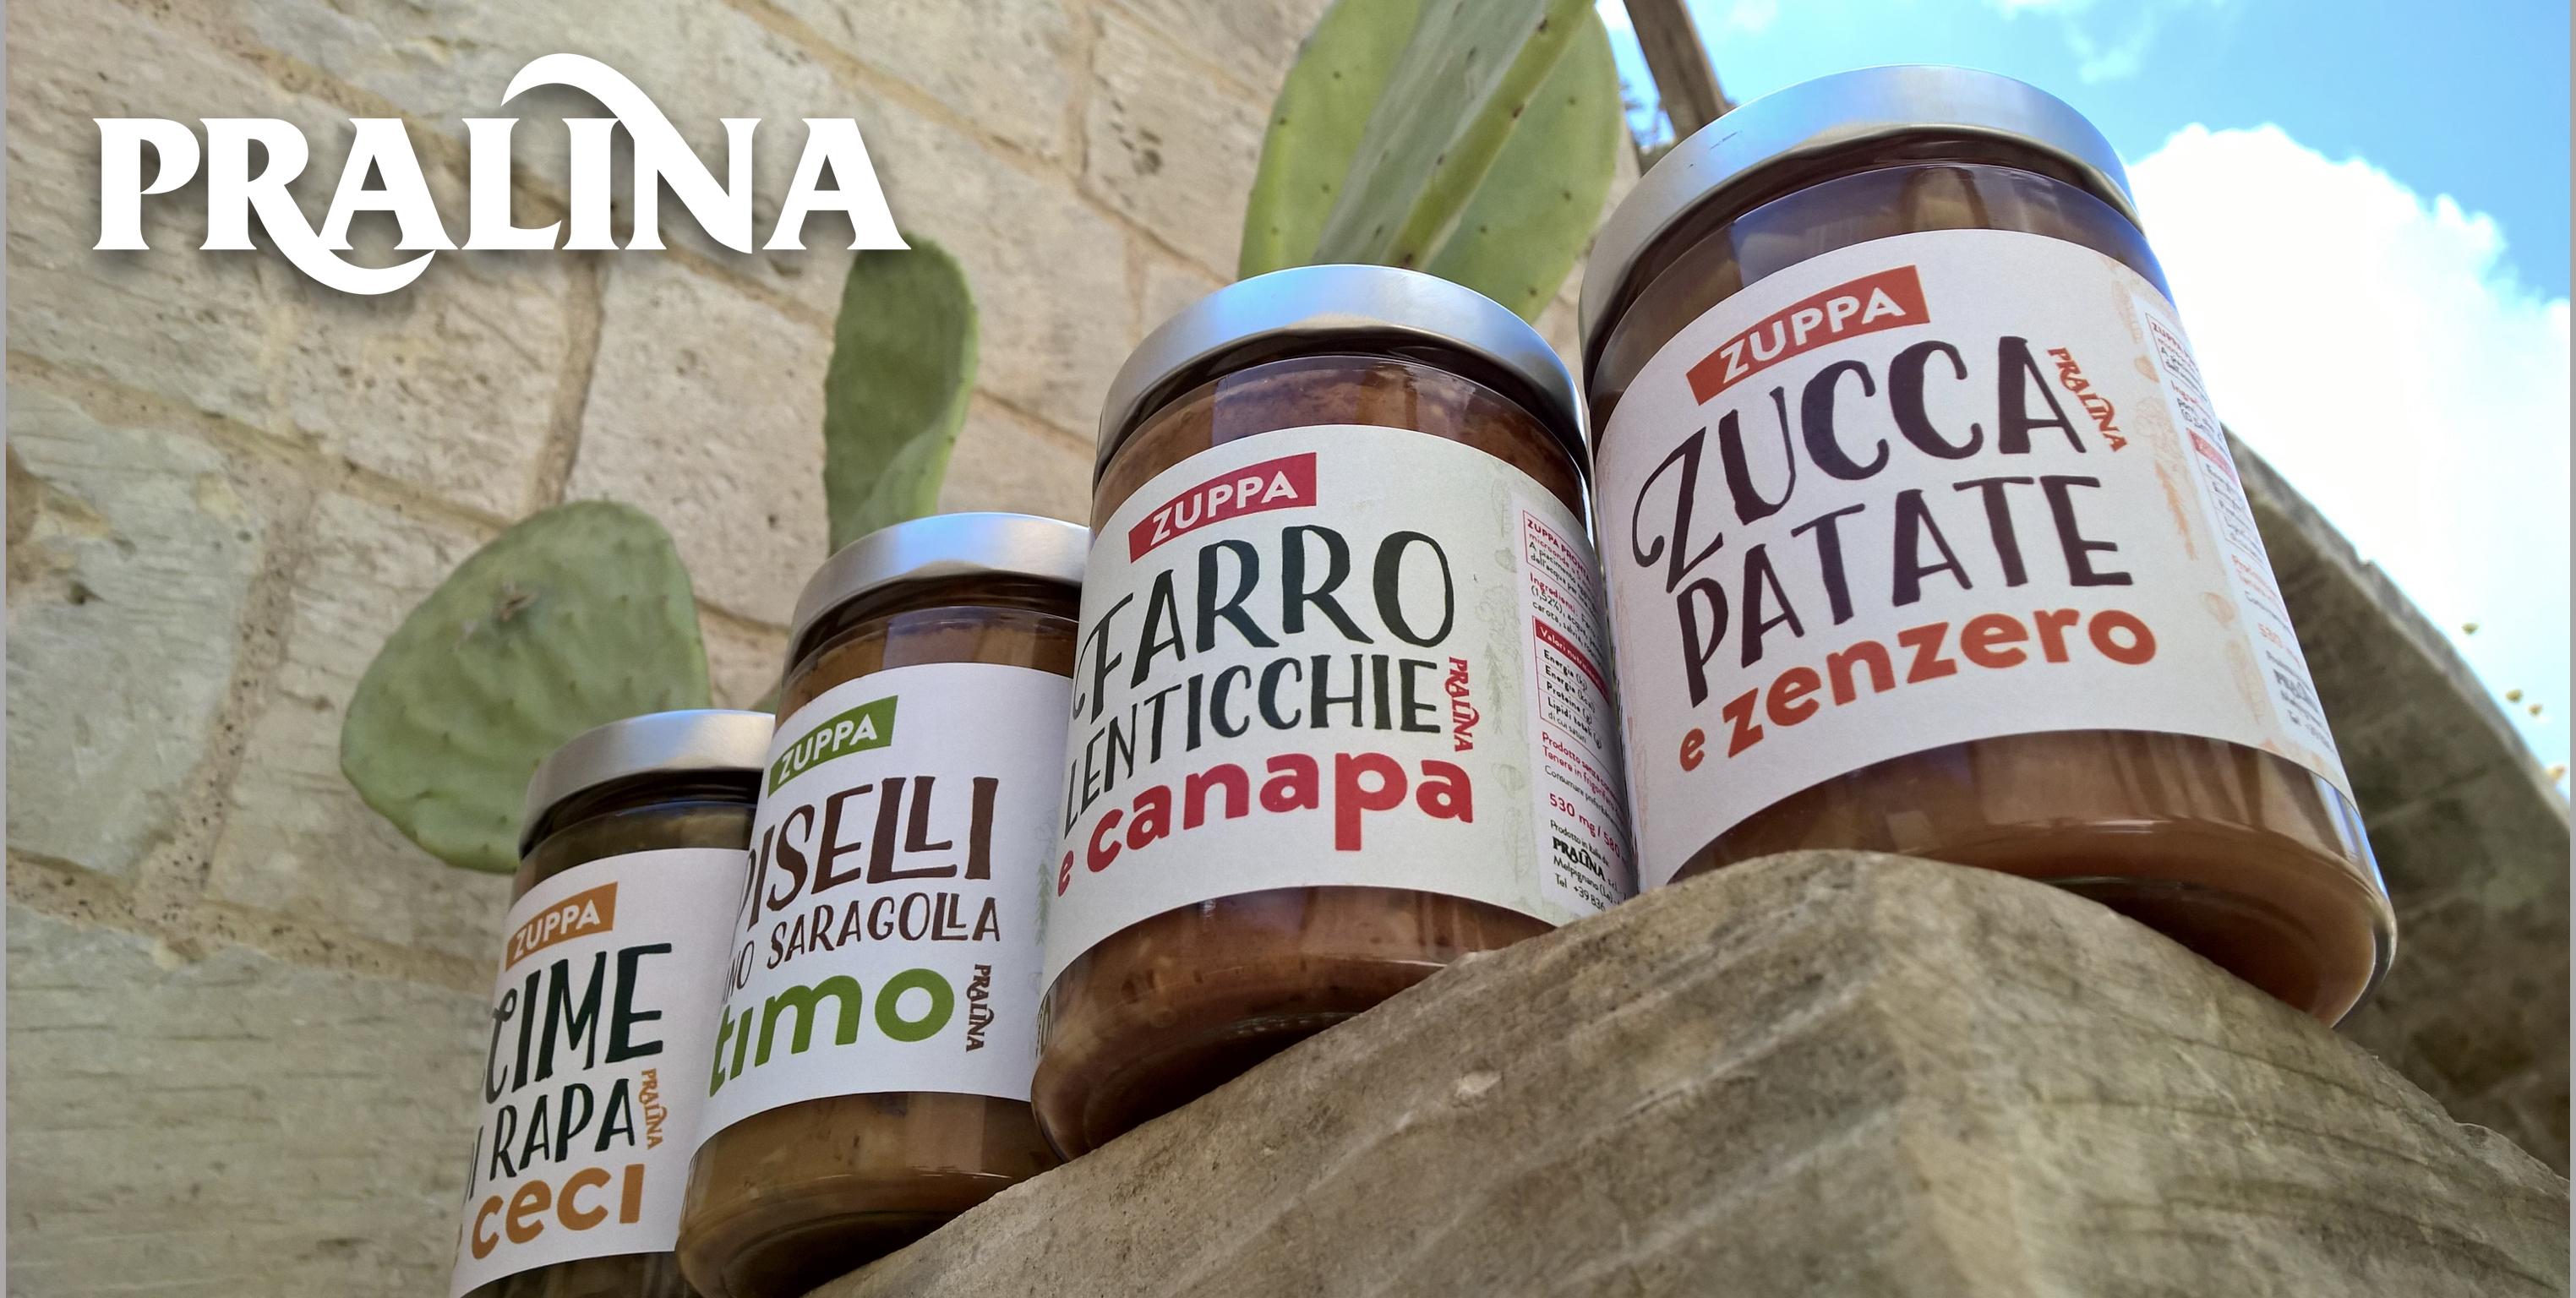 pralina-zuppe-biodiverse-crowdfudning